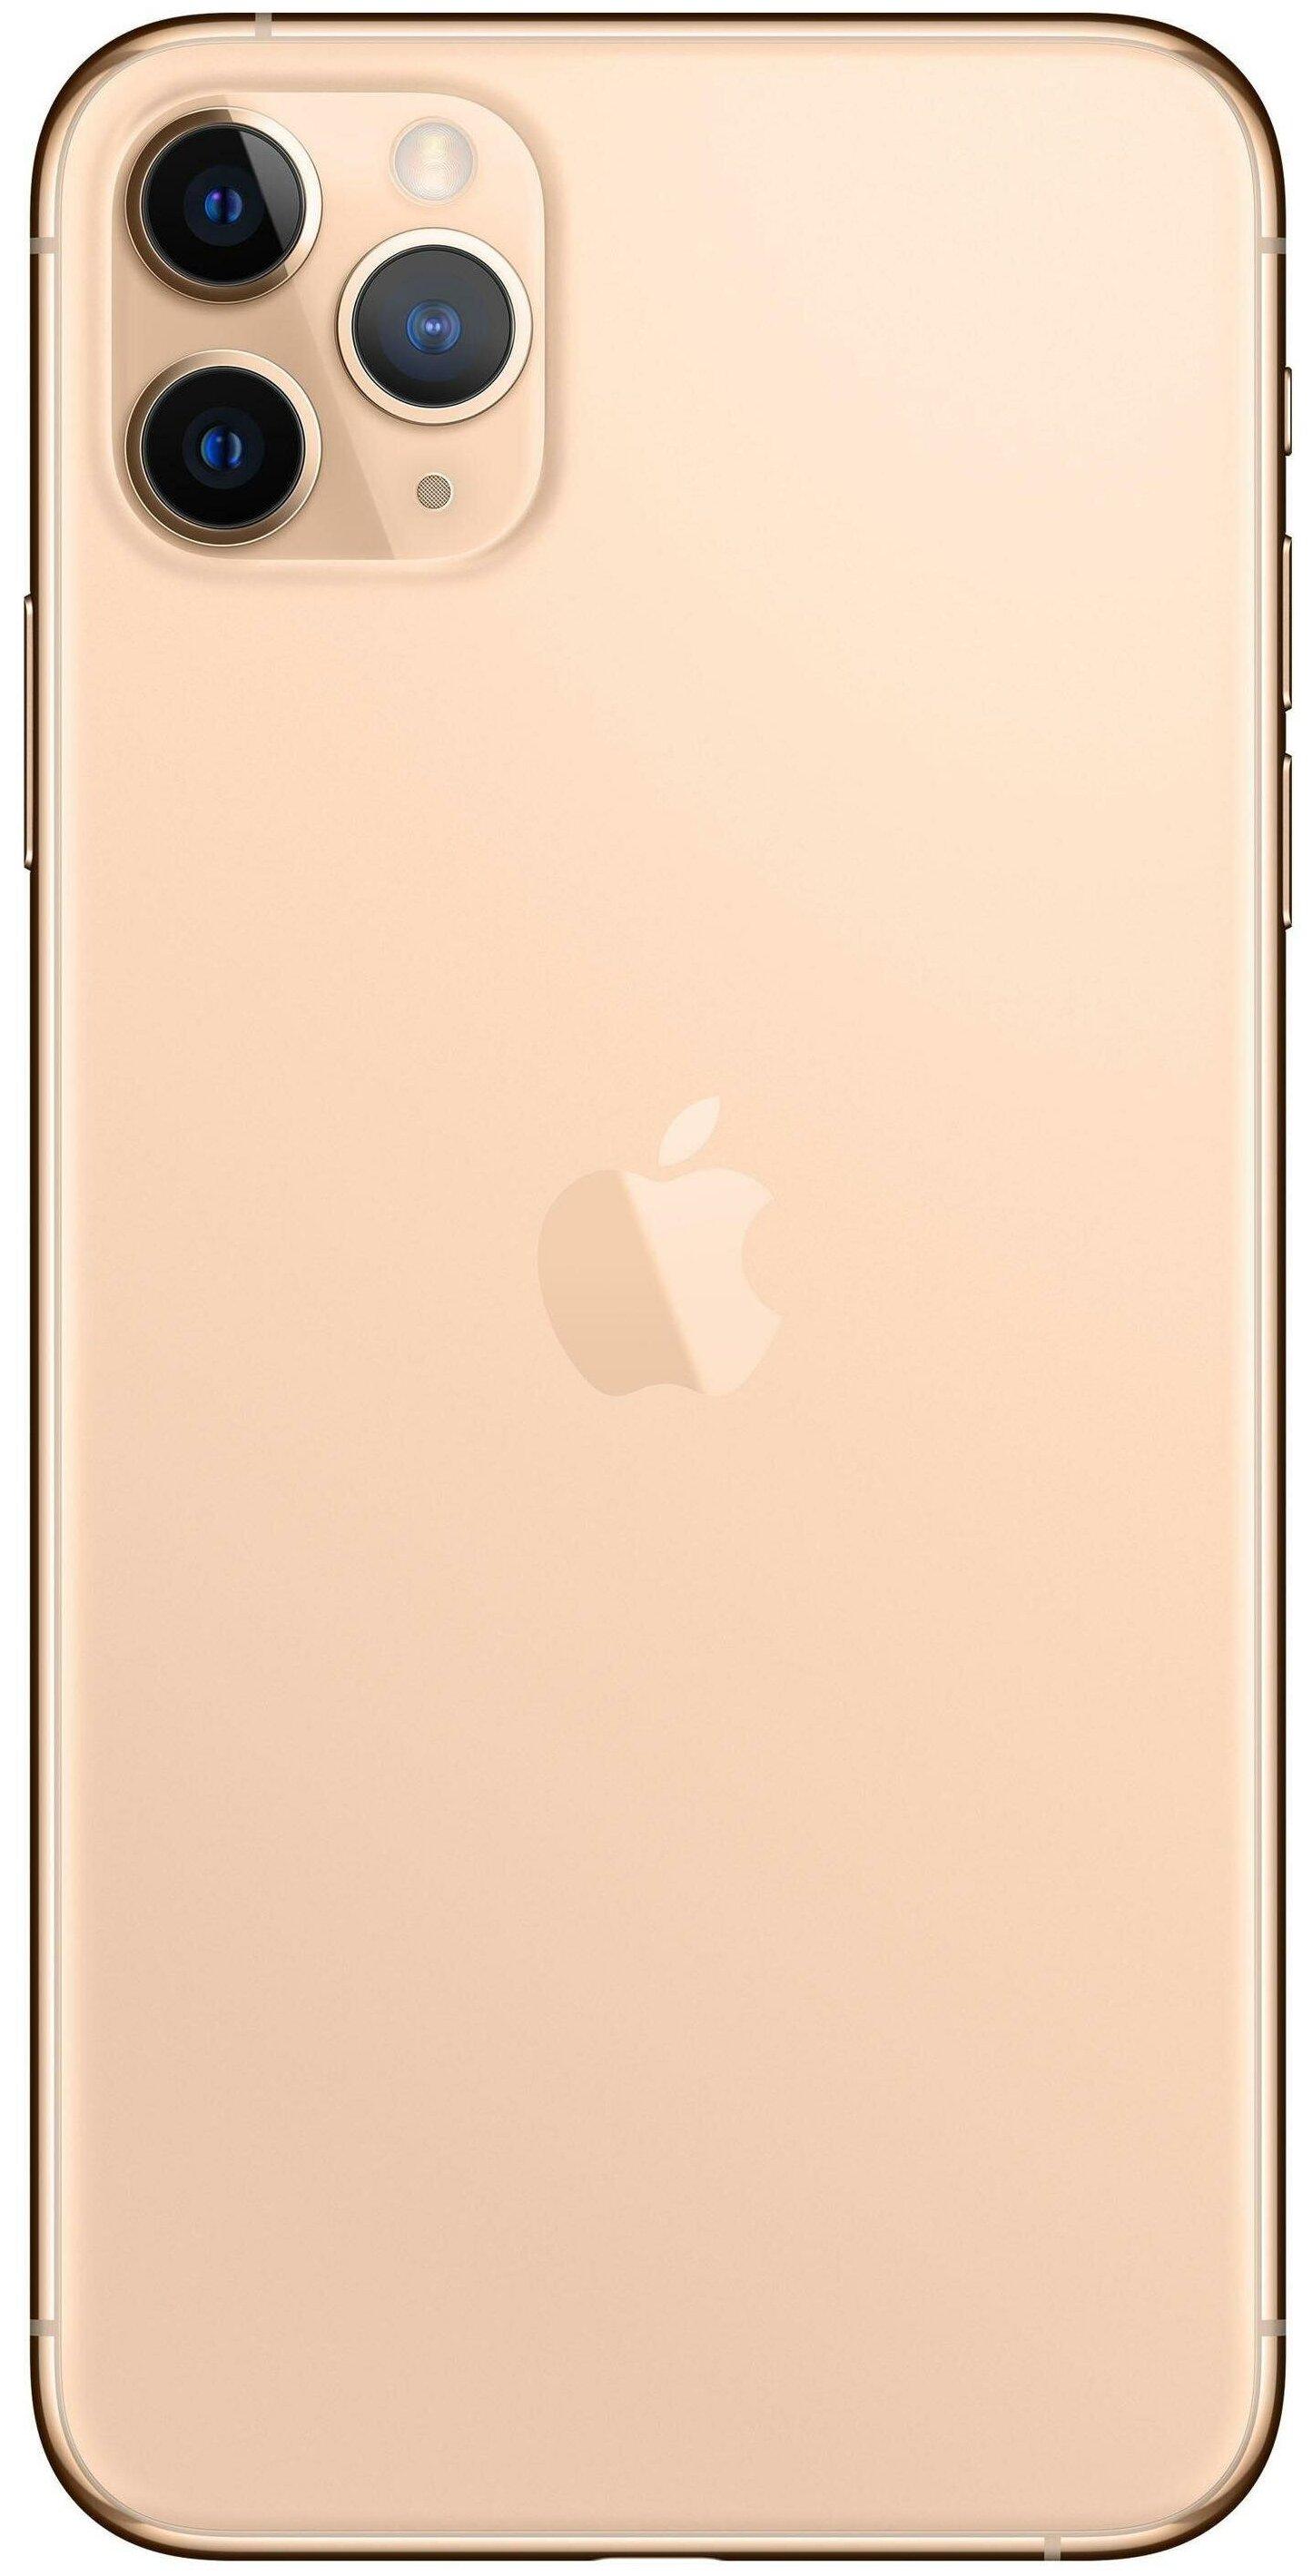 Apple iPhone 11 Pro Max 512GB - оперативная память: 4ГБ